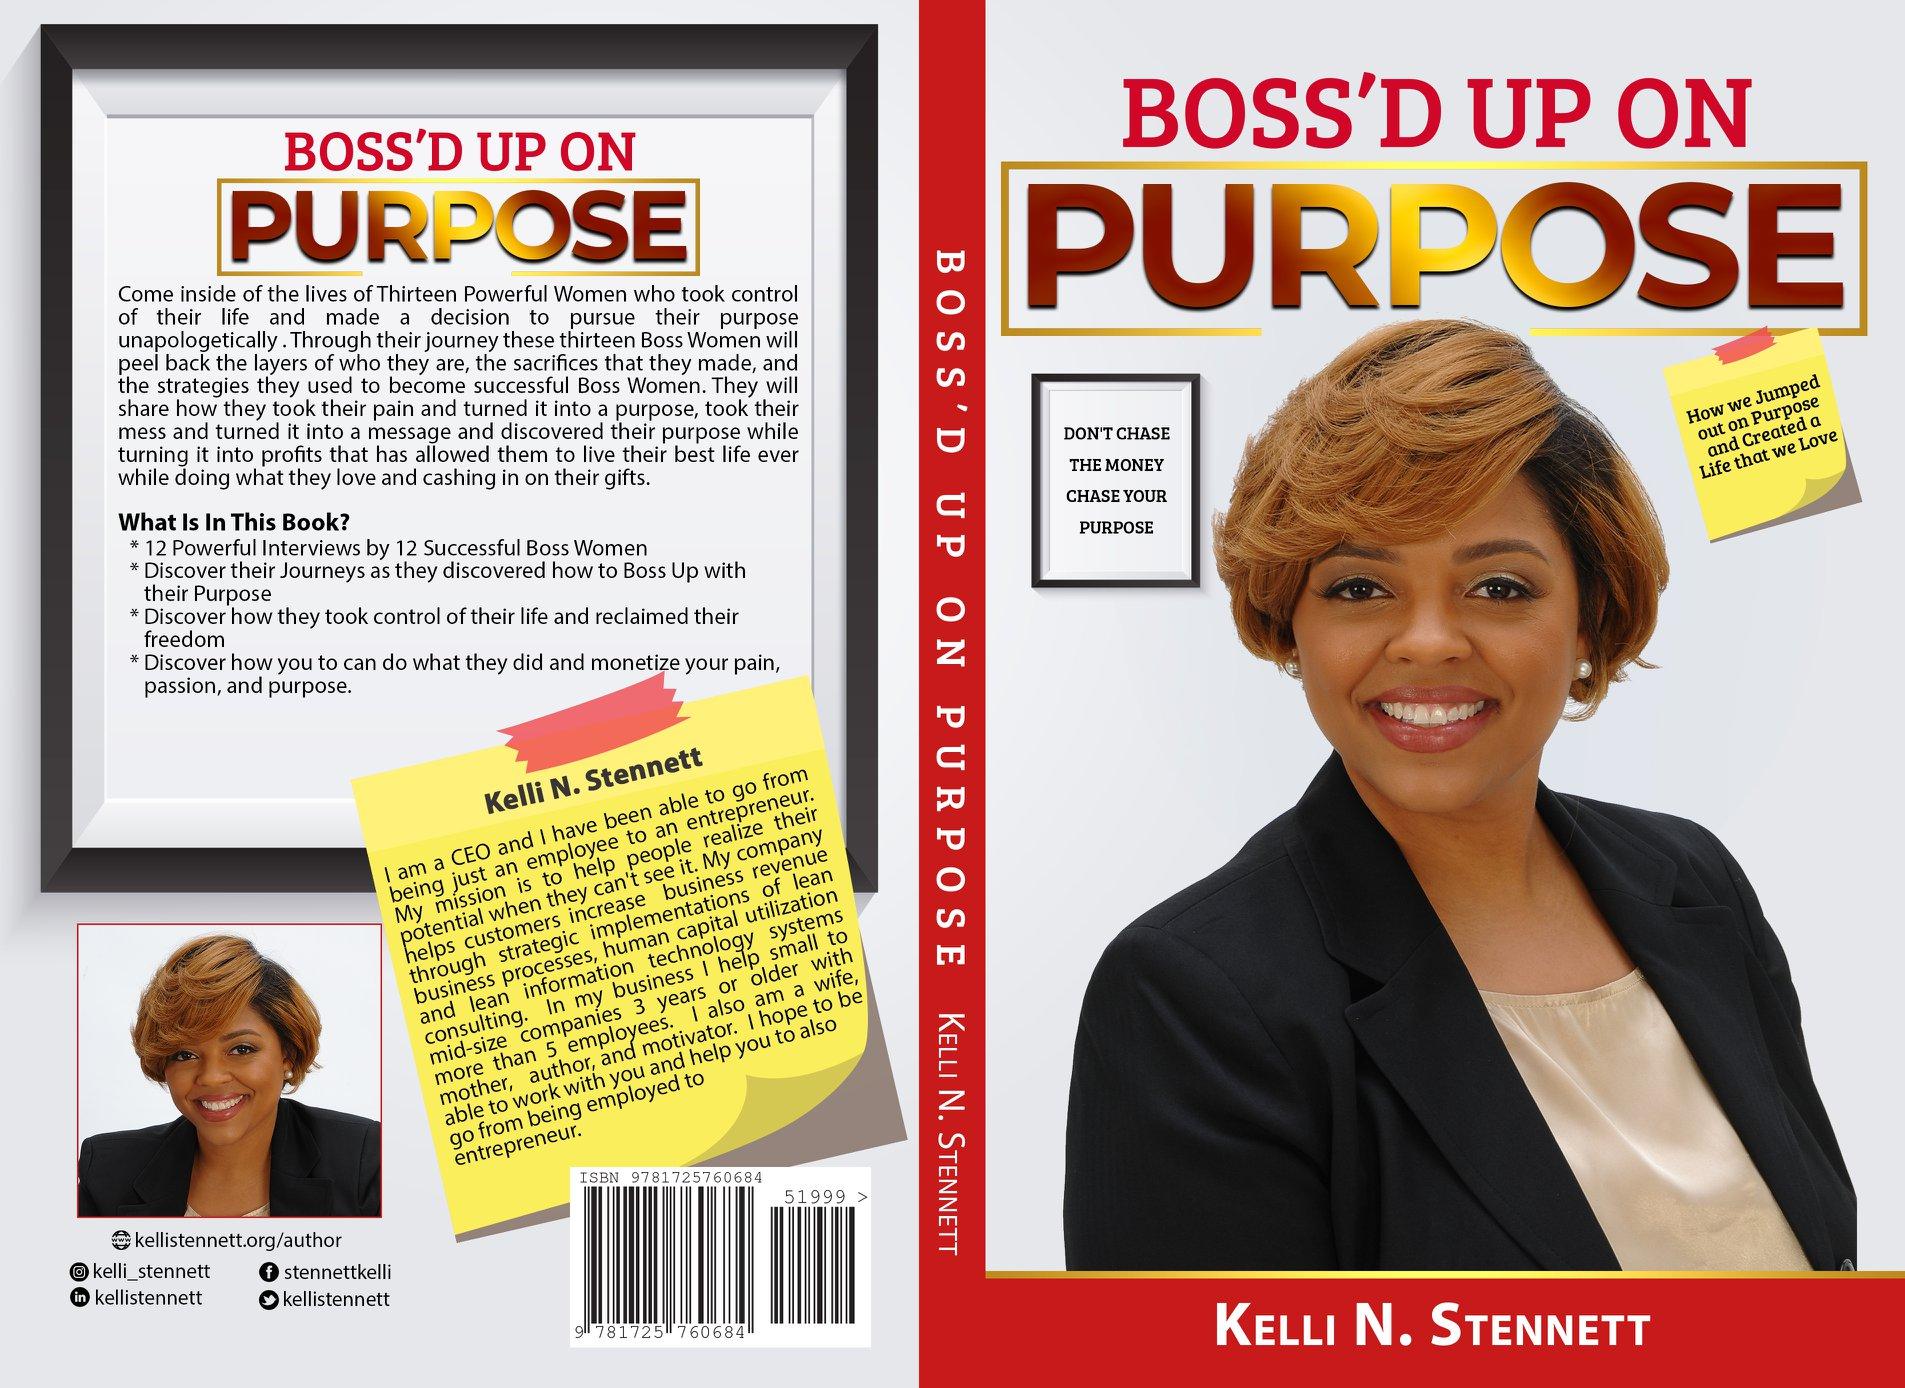 bossduponpurpose_front_back.jpg